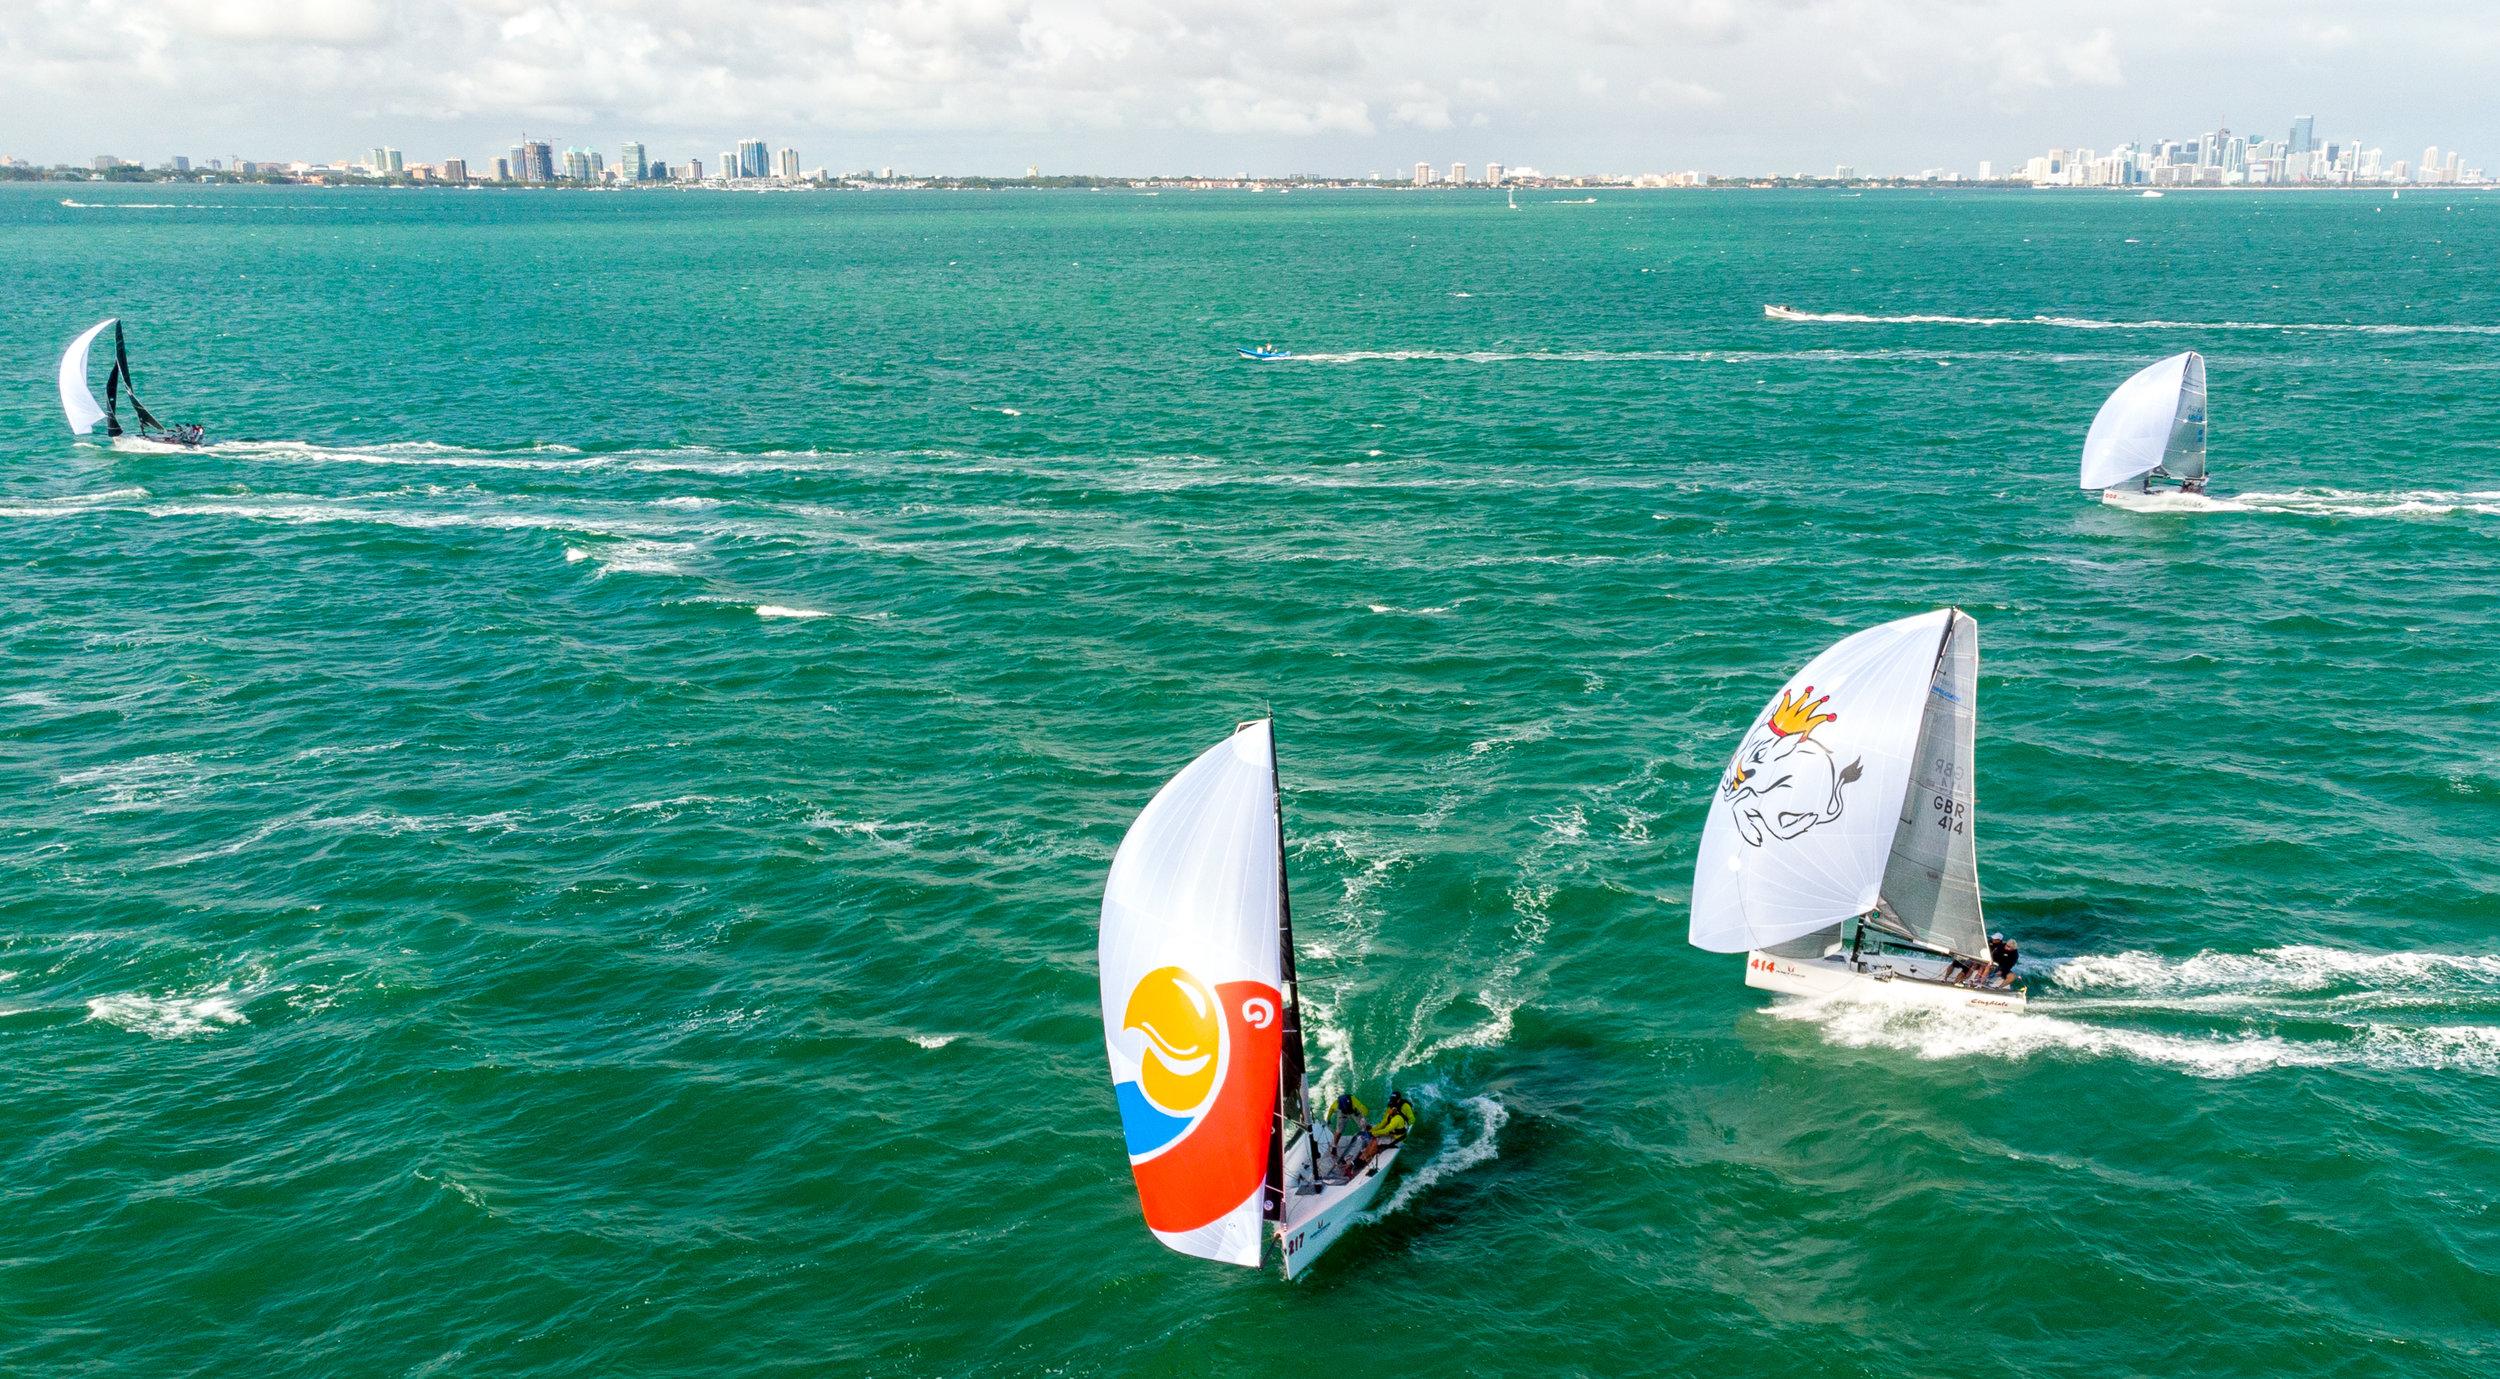 Miami_Melges20_100219_187.jpg